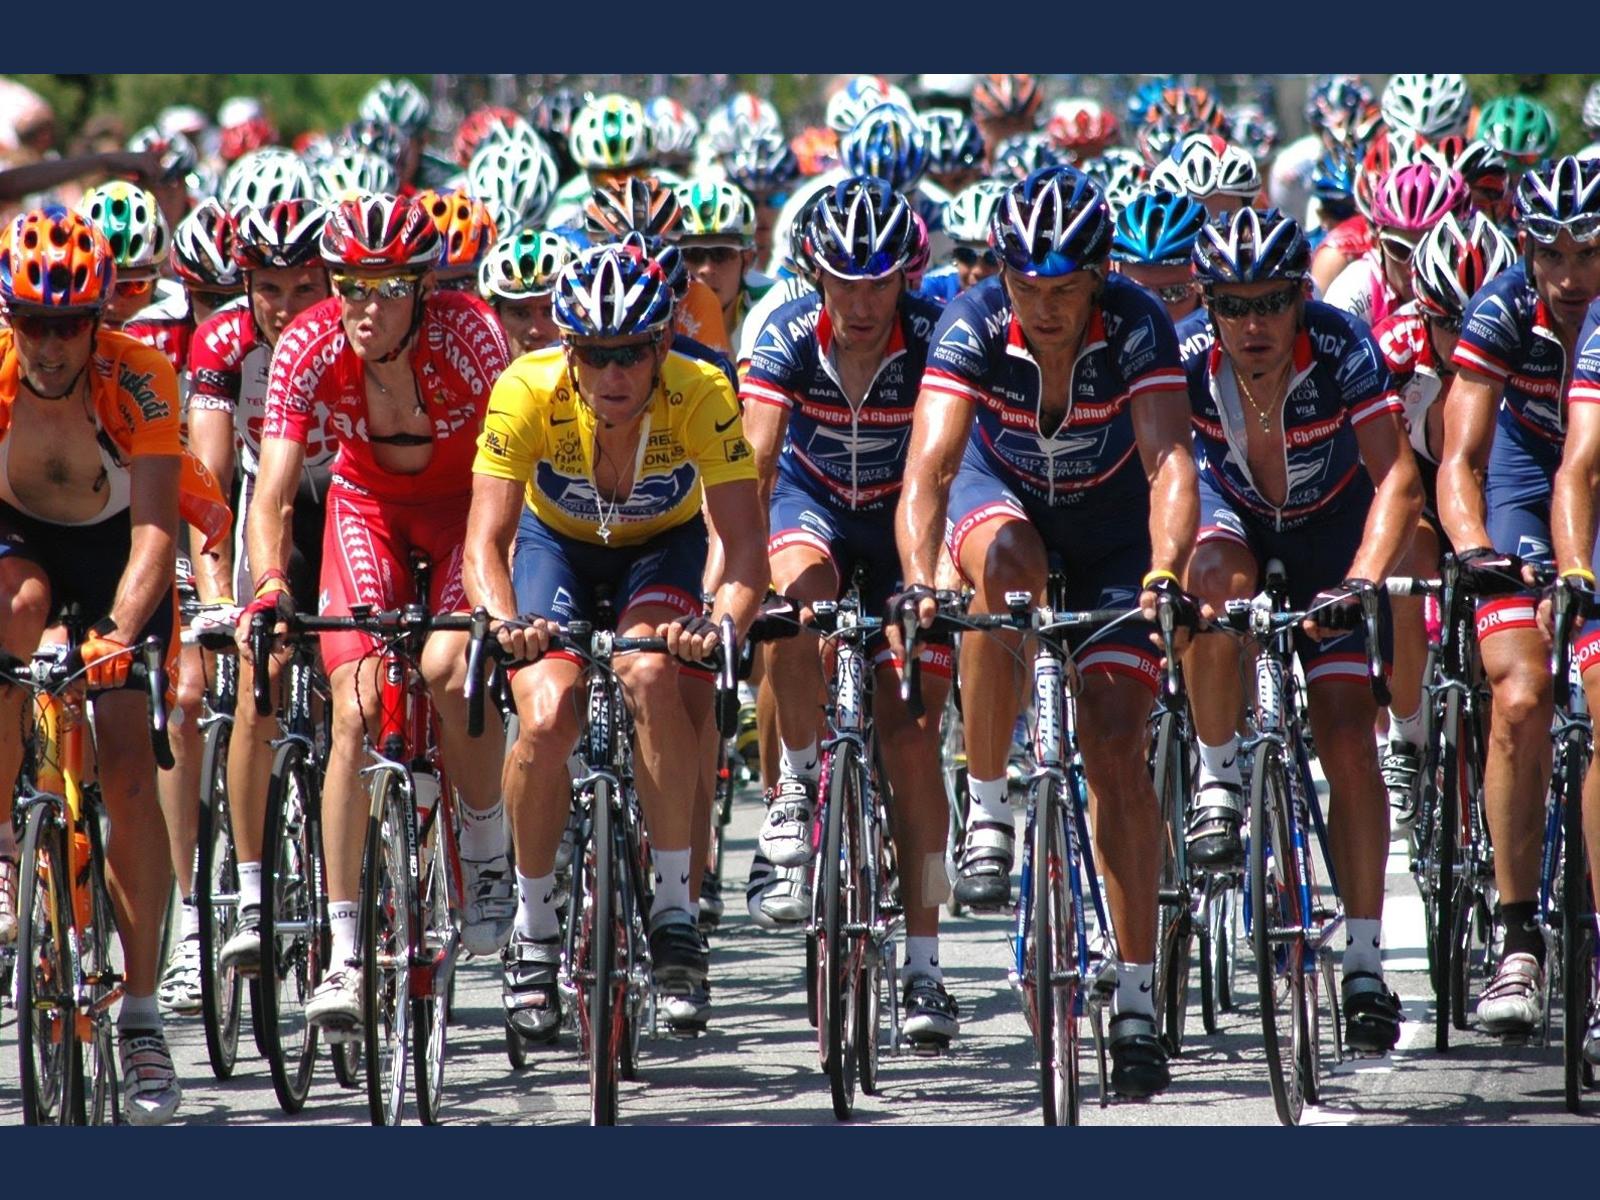 Tour de France 2010 computer desktop wallpaper 1600x1200